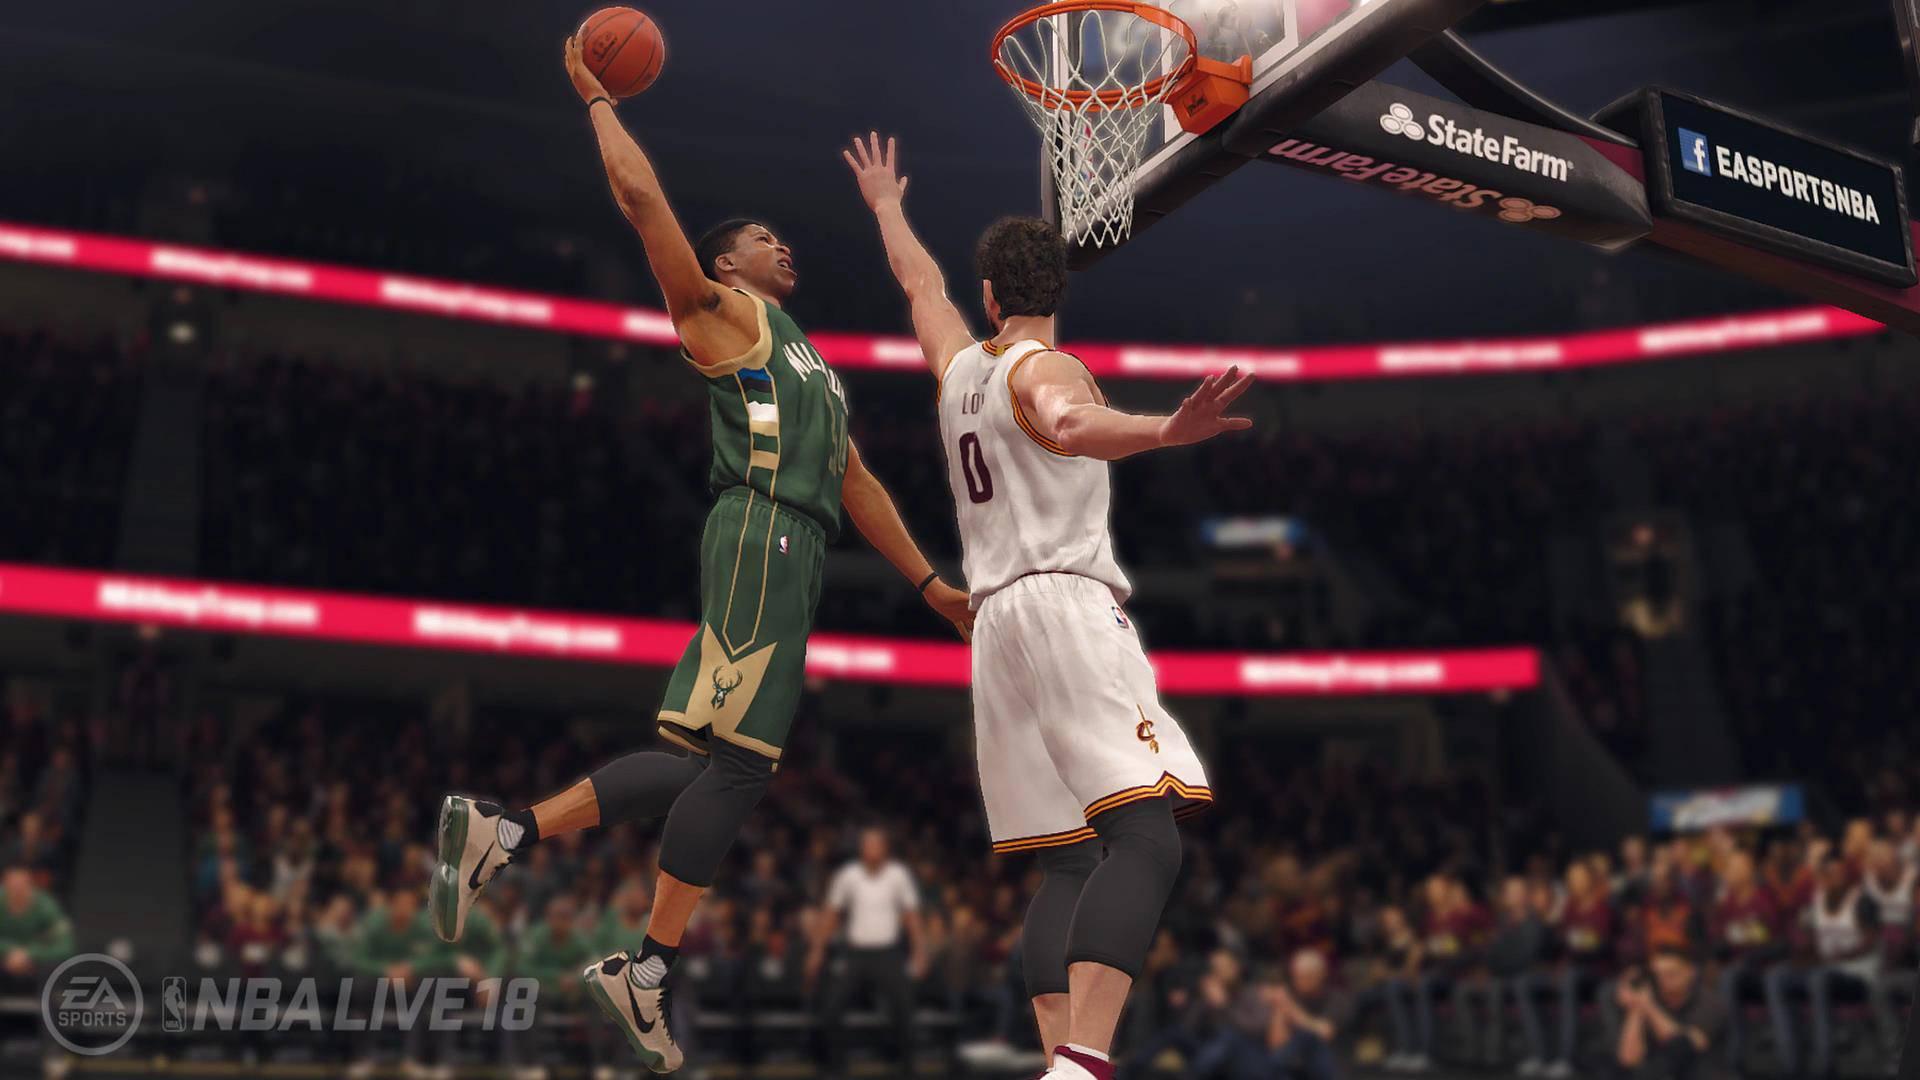 NBA Live 18 - GameSpace.com